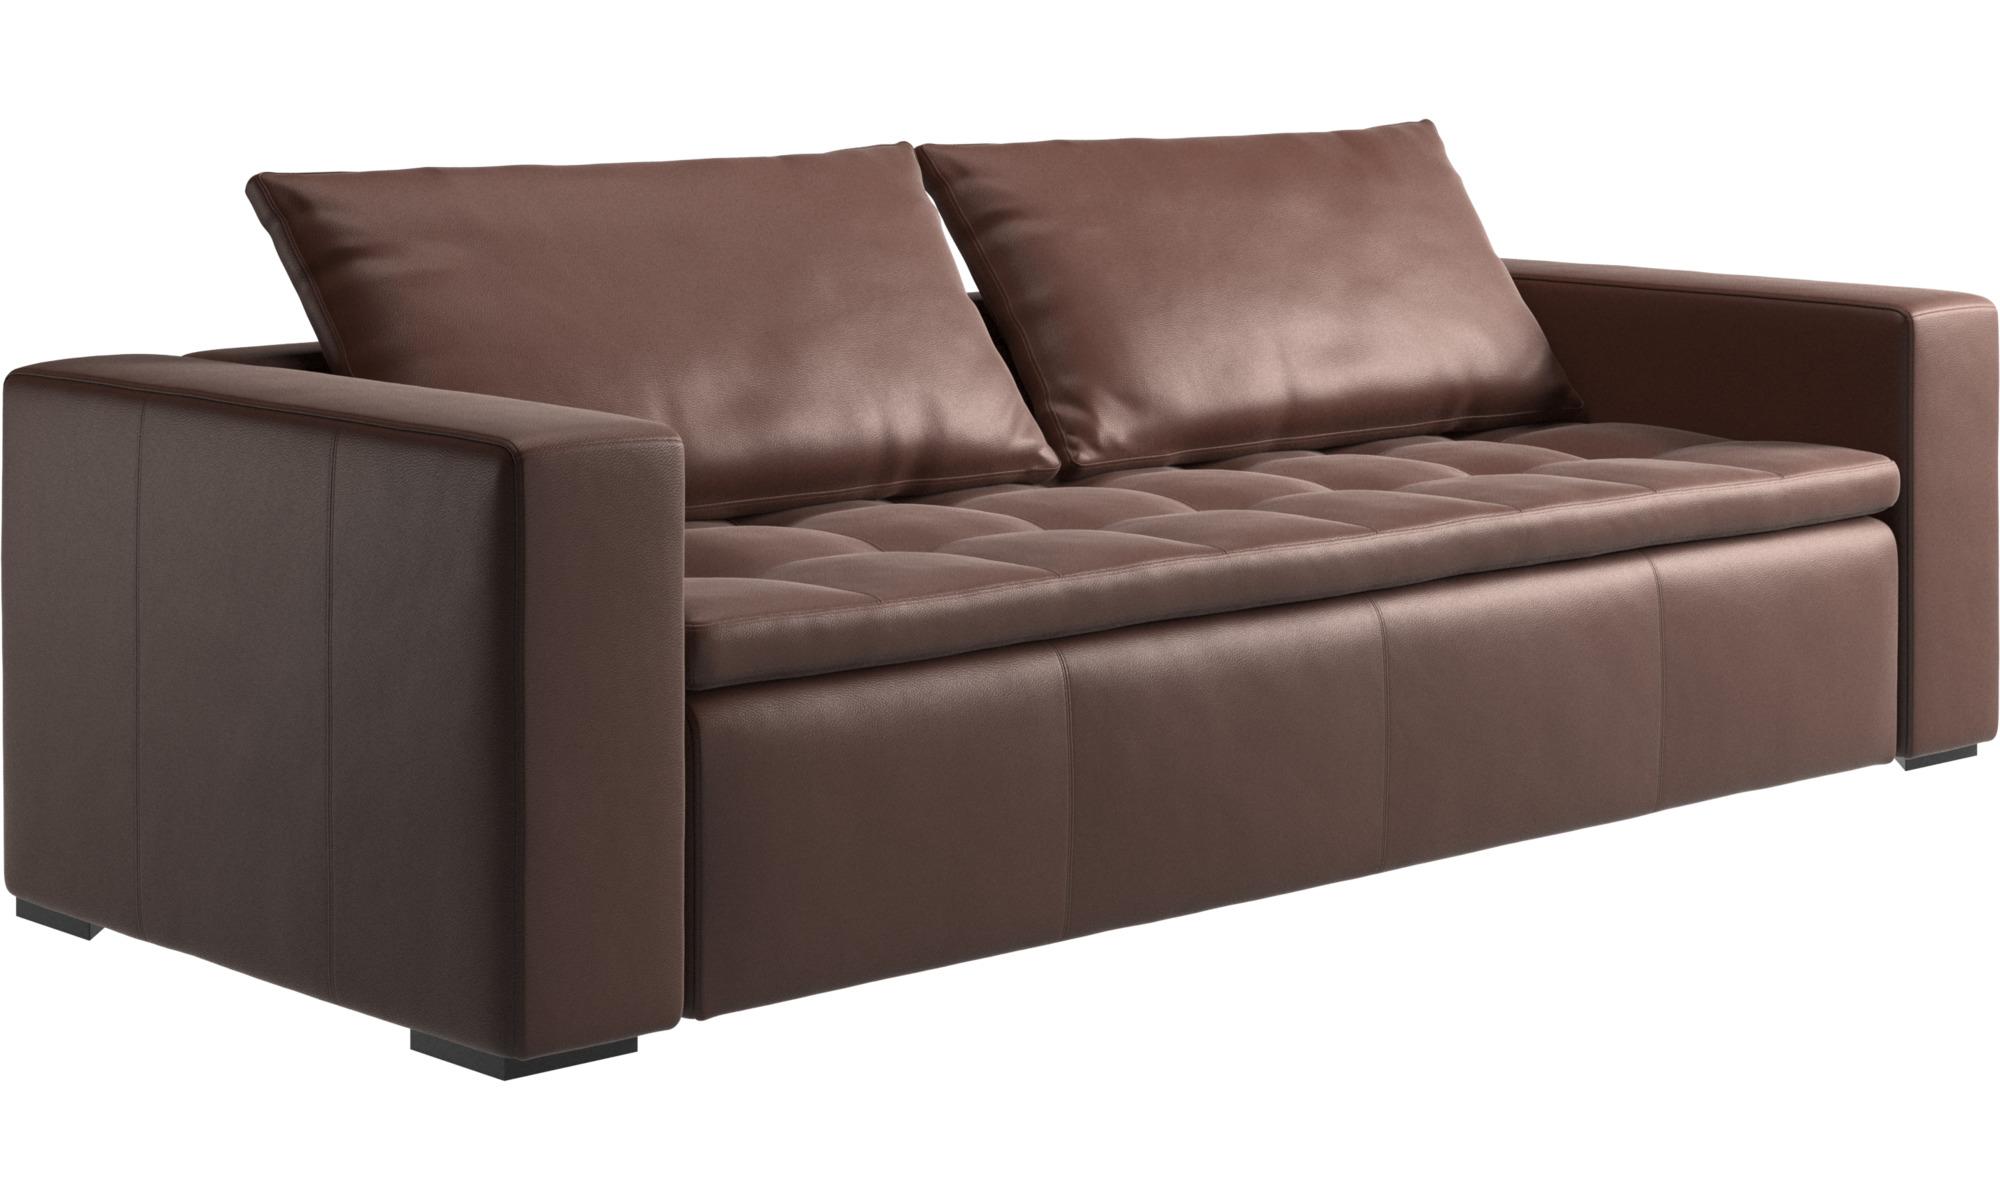 mezzo sofa boconcept mezzo sofa yelp thesofa. Black Bedroom Furniture Sets. Home Design Ideas